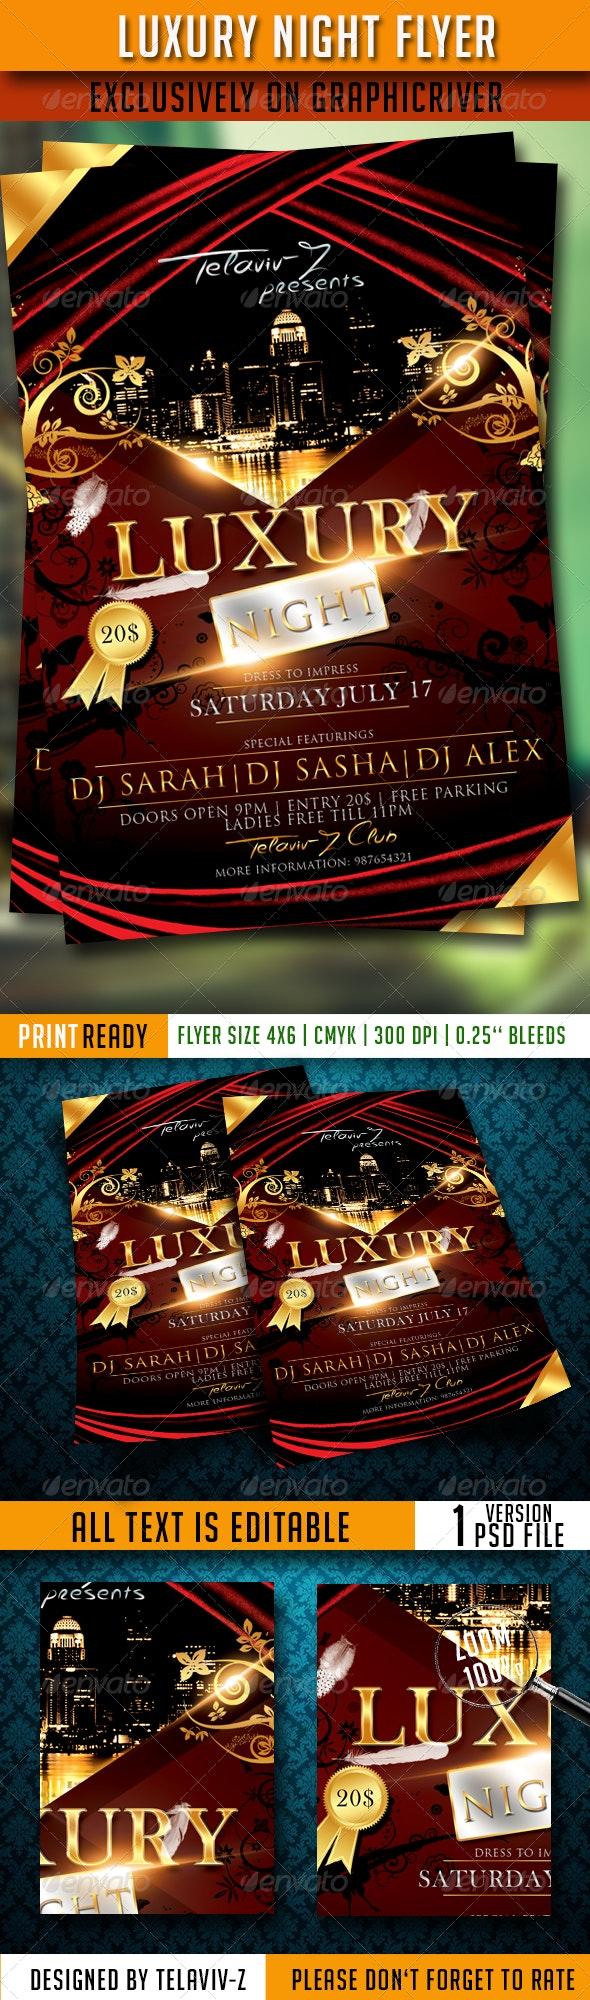 Luxury Night Flyer Template - Print Templates